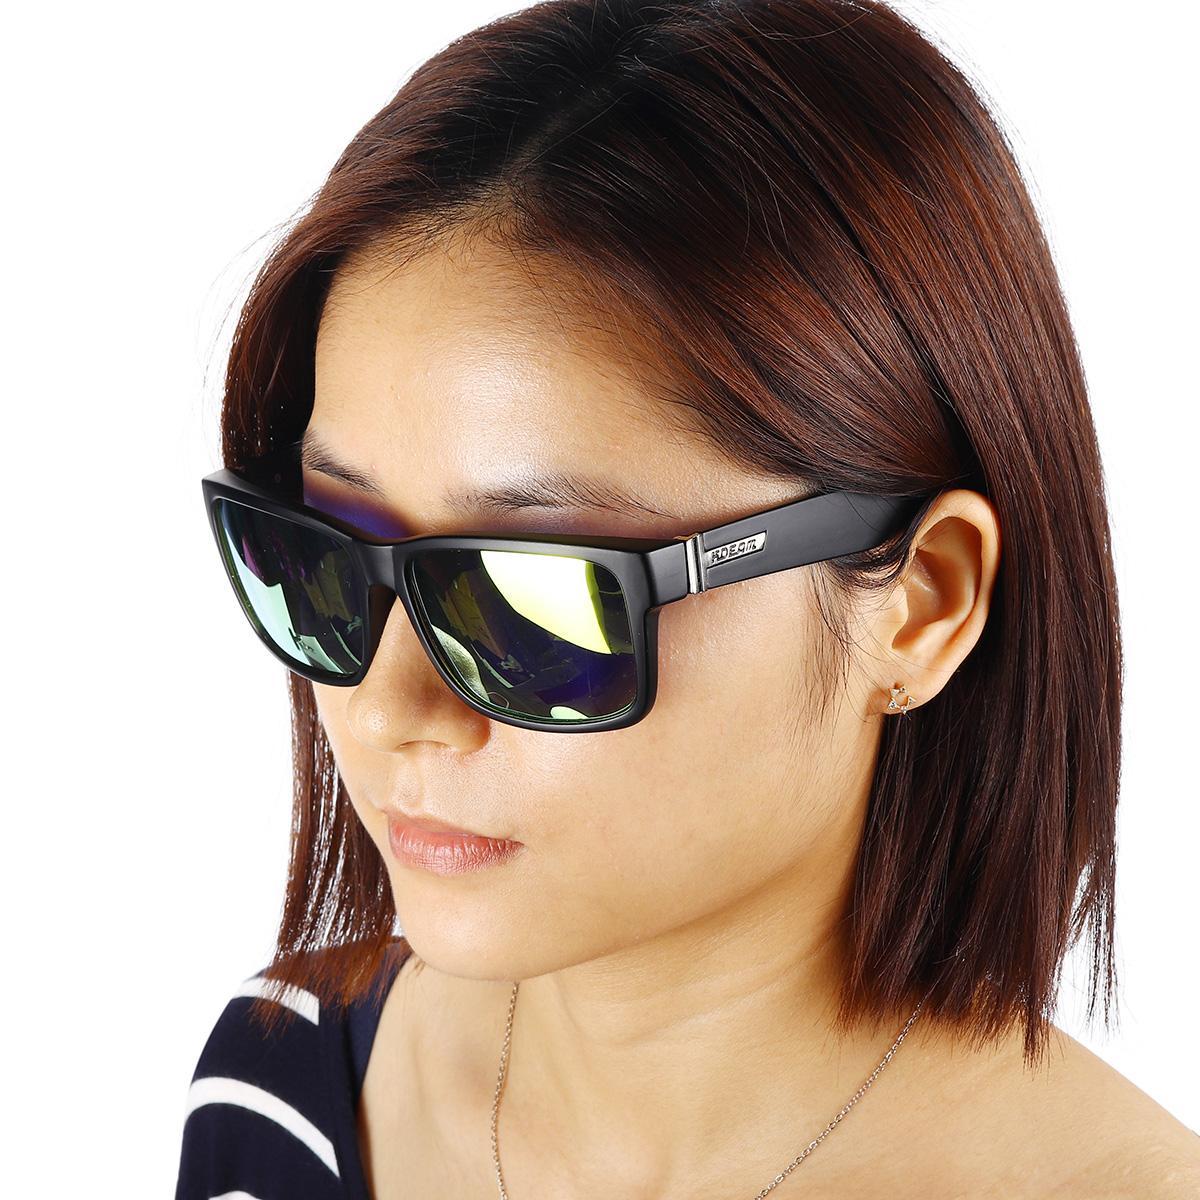 7a0f6e63d Kdeam Polarized Sunglasses Retro Outdoor Sport Drivng Helm Sun Glasses  Eyewear Blue - intl